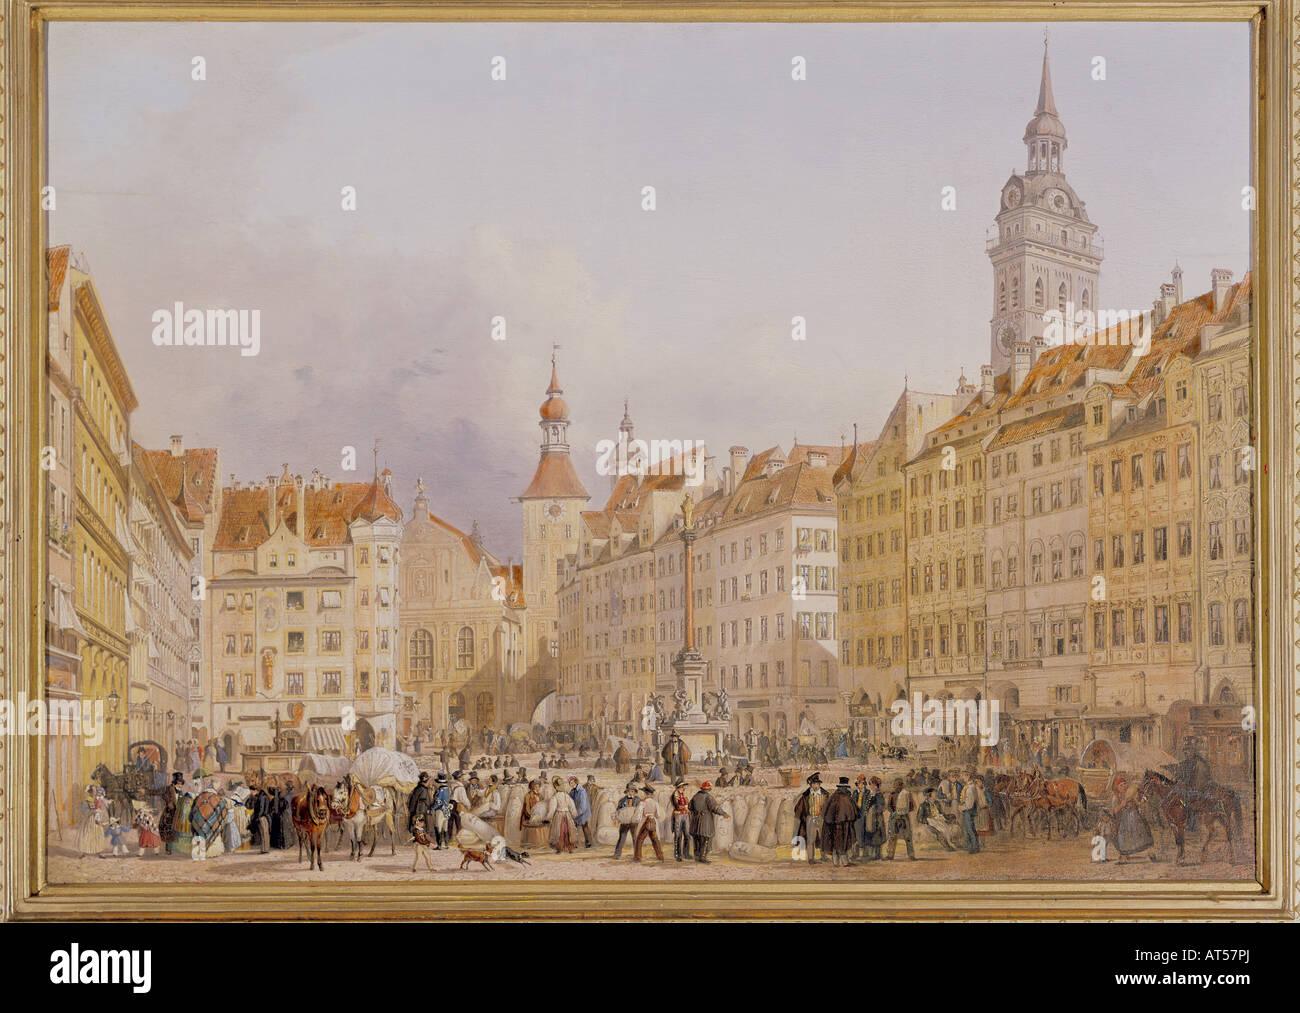 Fine Arts, Adam, Albrecht (1786   1862), Painting, Marienplatz In